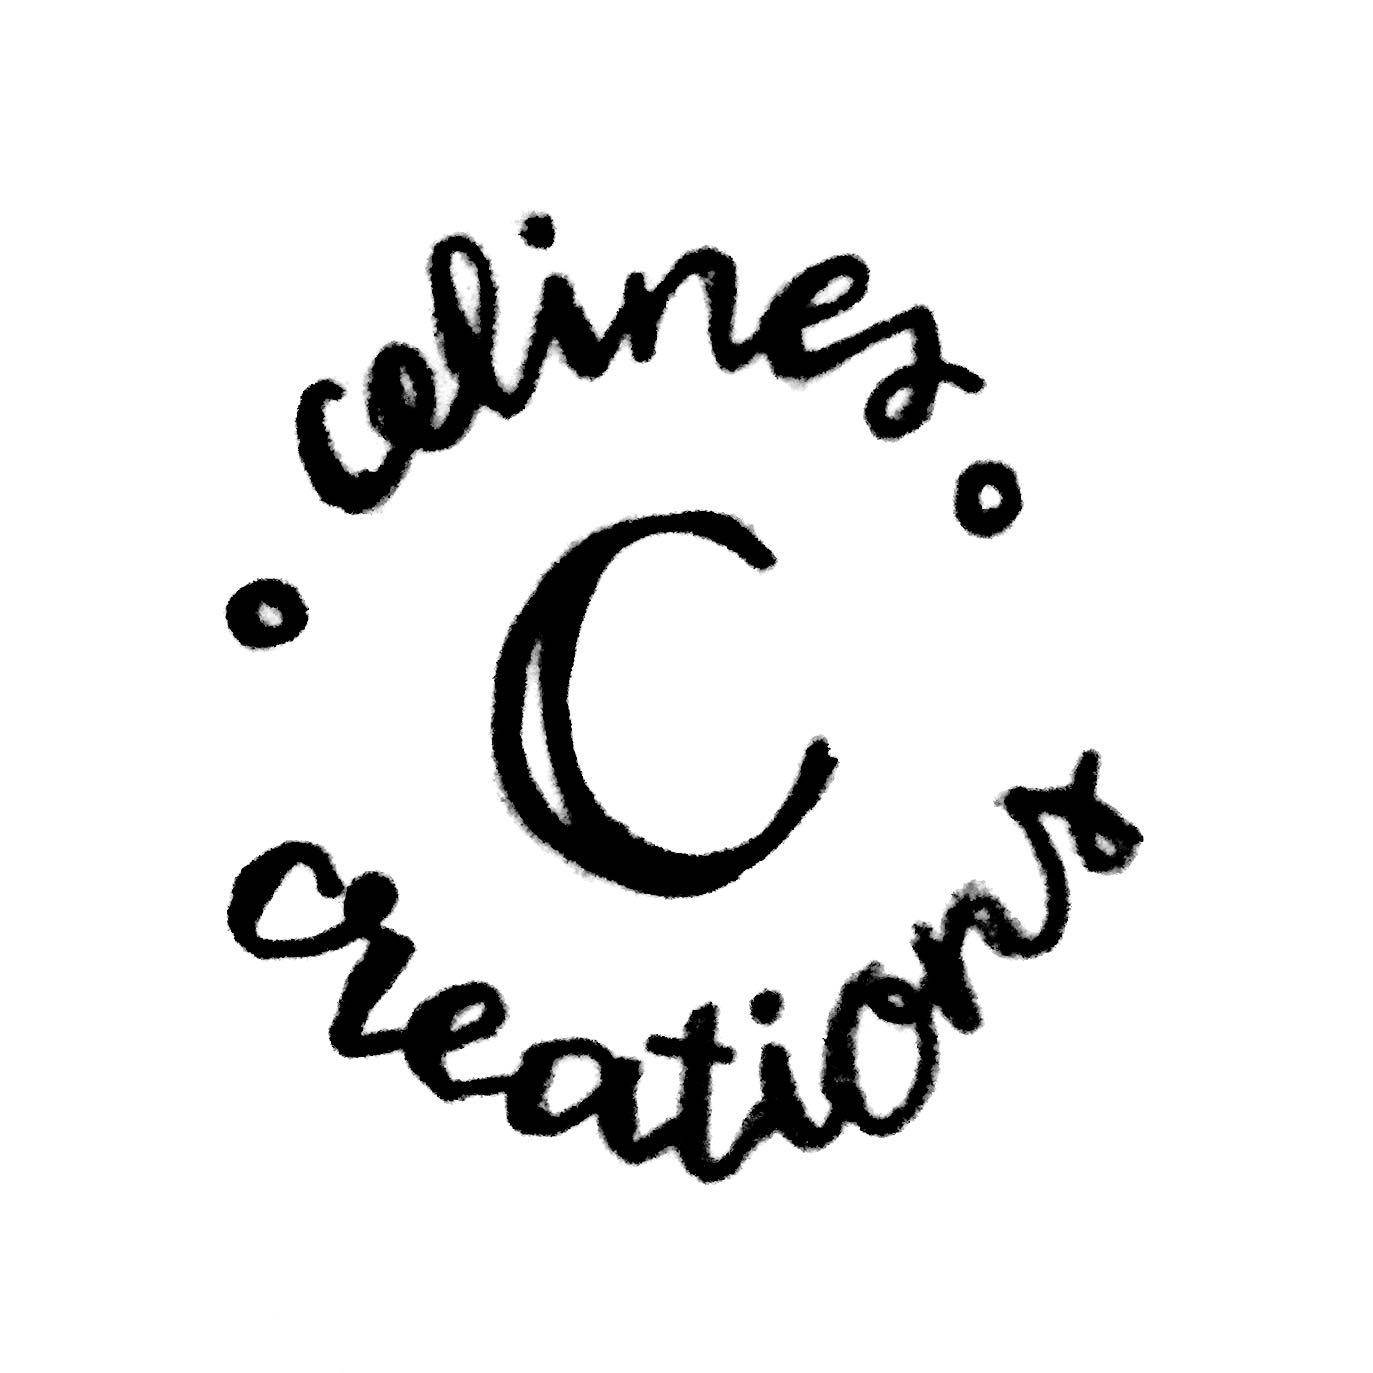 celines.creations